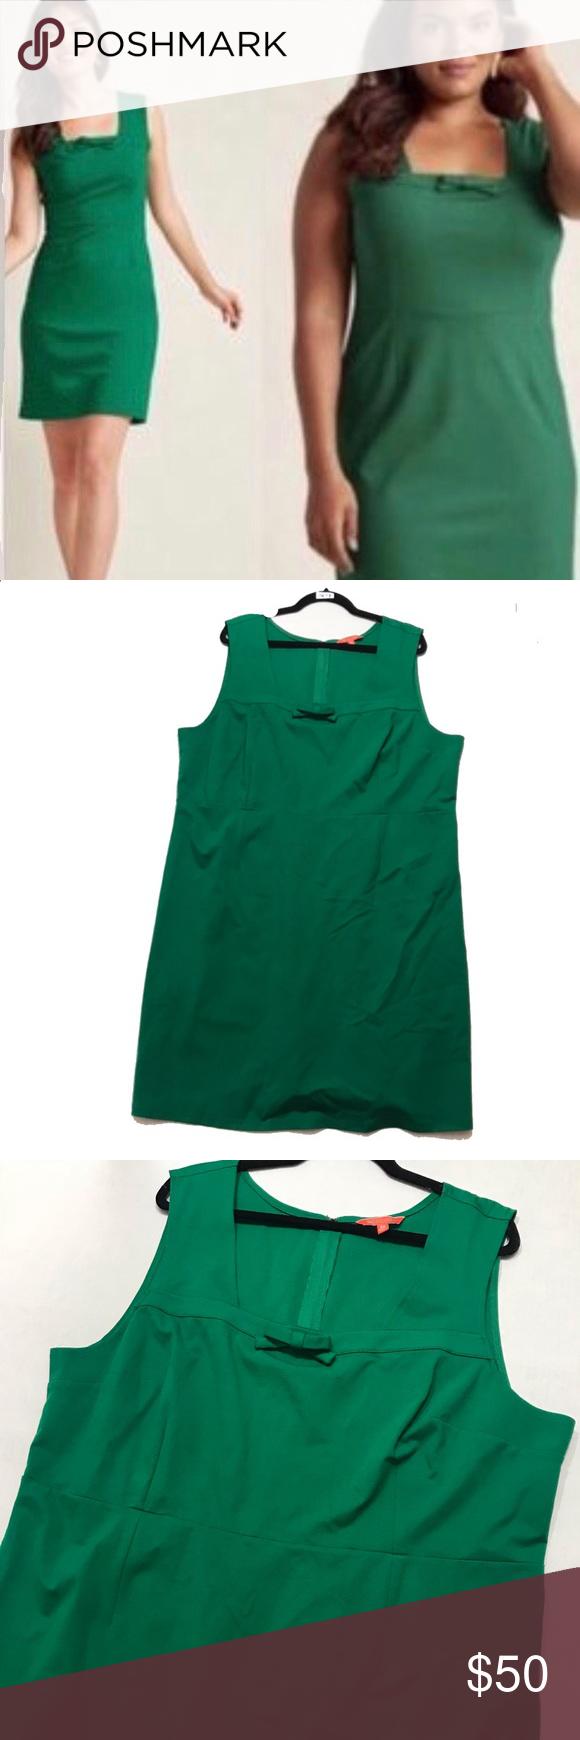 7b6ab2eea28 Modcloth Kelly Green Sleeveless Sheath Dress Modcloth Kelly Green  Sleeveless Sheath Dress. Women s size 3X